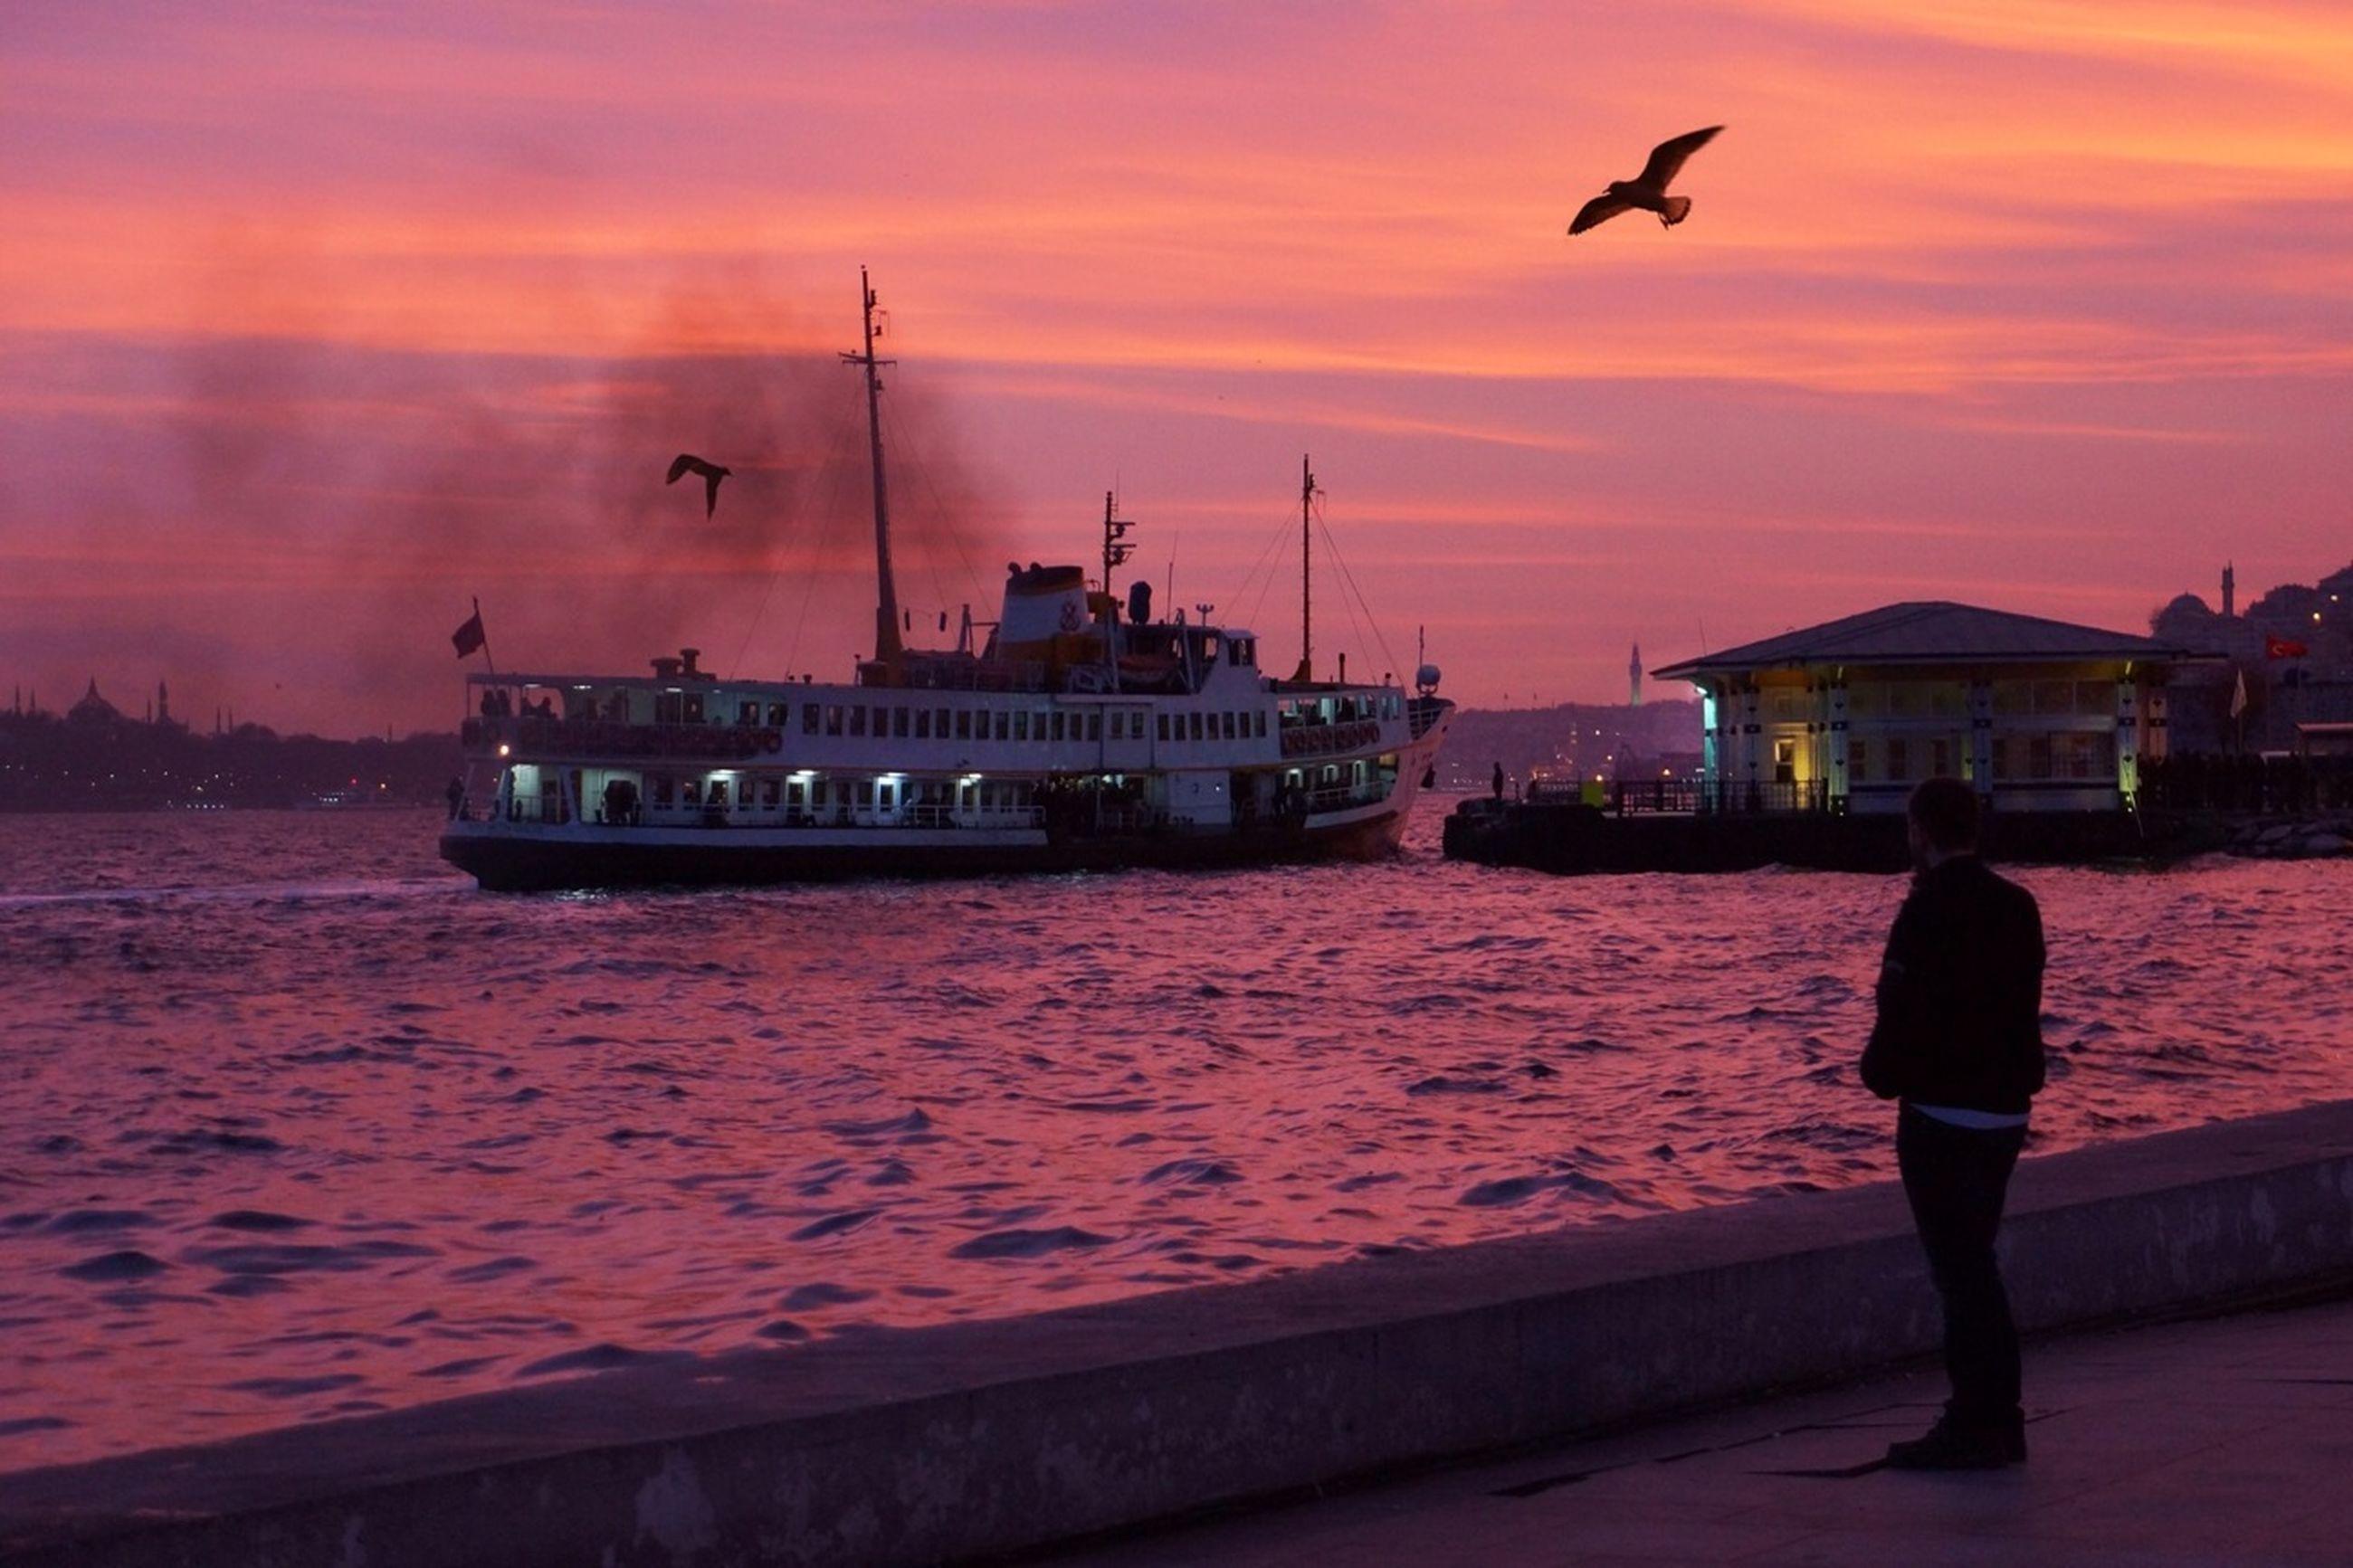 sunset, water, sky, built structure, orange color, sea, architecture, building exterior, bird, lifestyles, flying, leisure activity, men, silhouette, cloud - sky, pier, rear view, person